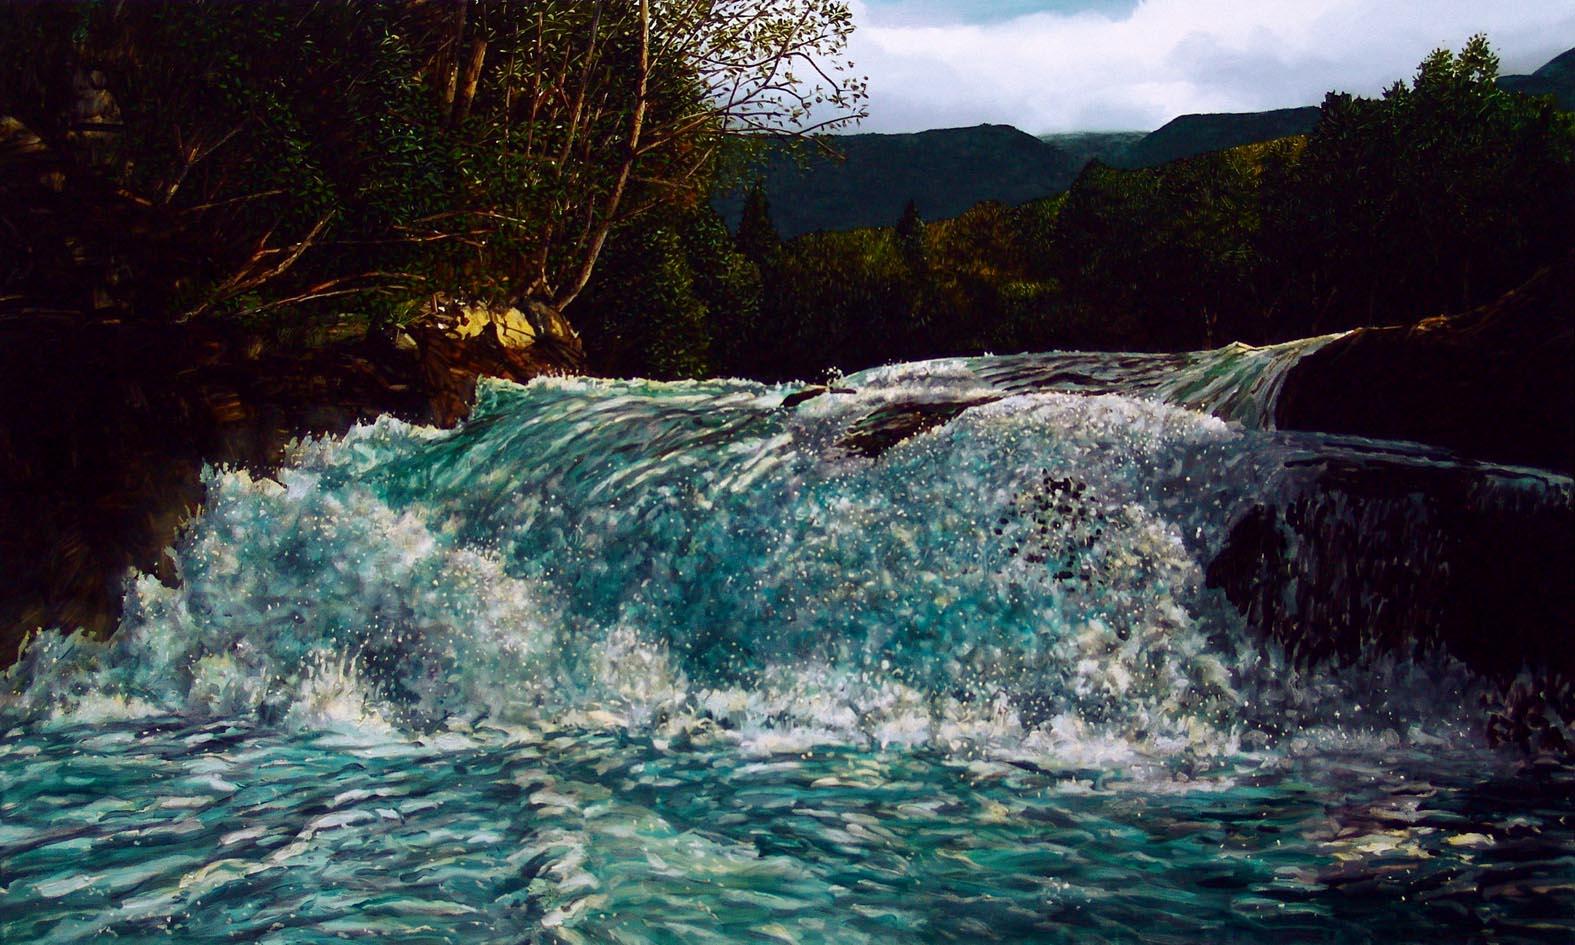 Waterfall, Gudbransjuvet, Norway  Oil on canvas, 250cm x 150cm